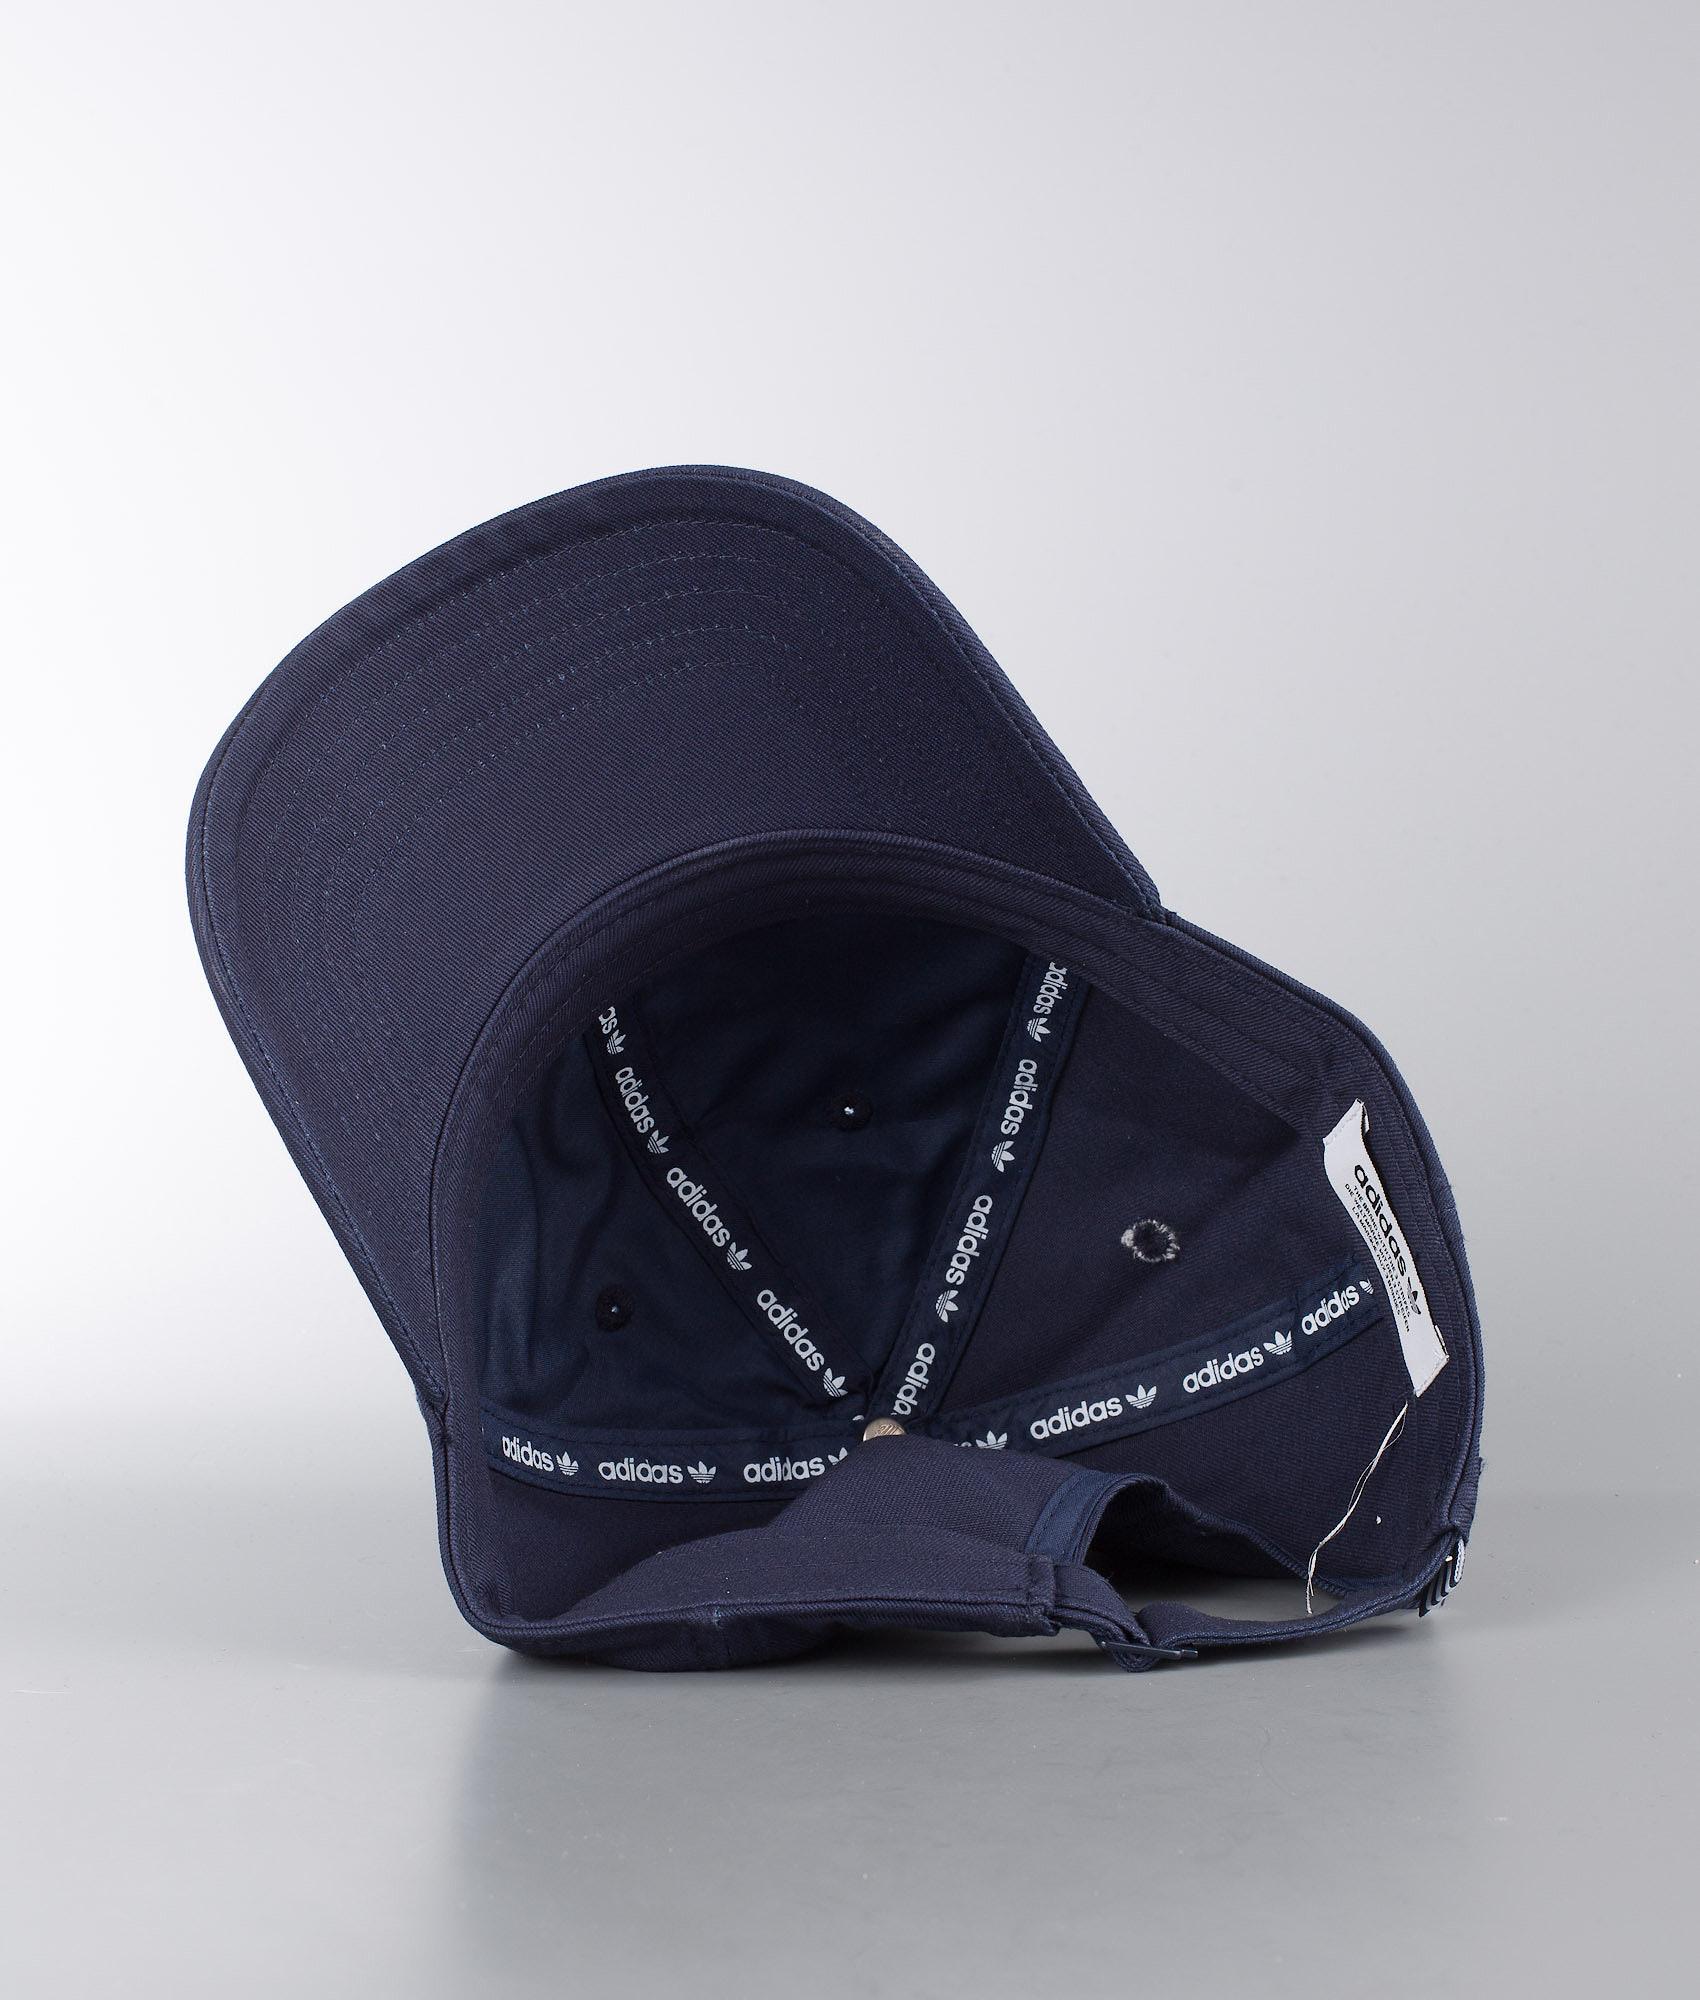 Adidas Originals Trefoil Lippis Collegiate Navy White - Ridestore.fi c9765e6b7a